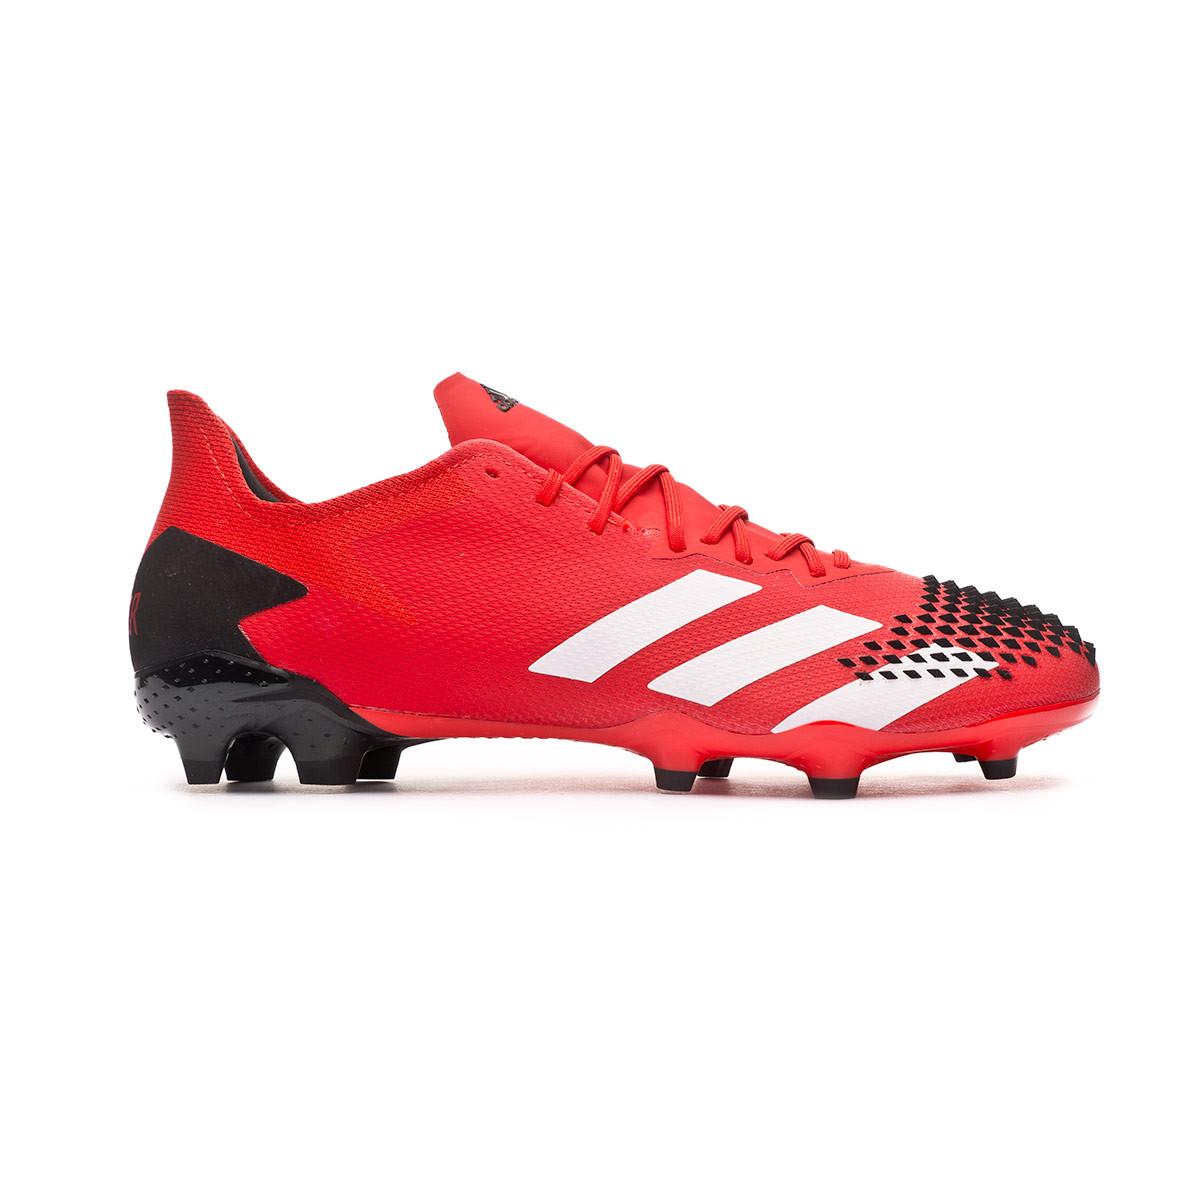 Chaussure de foot adidas Predator 20.2 FG